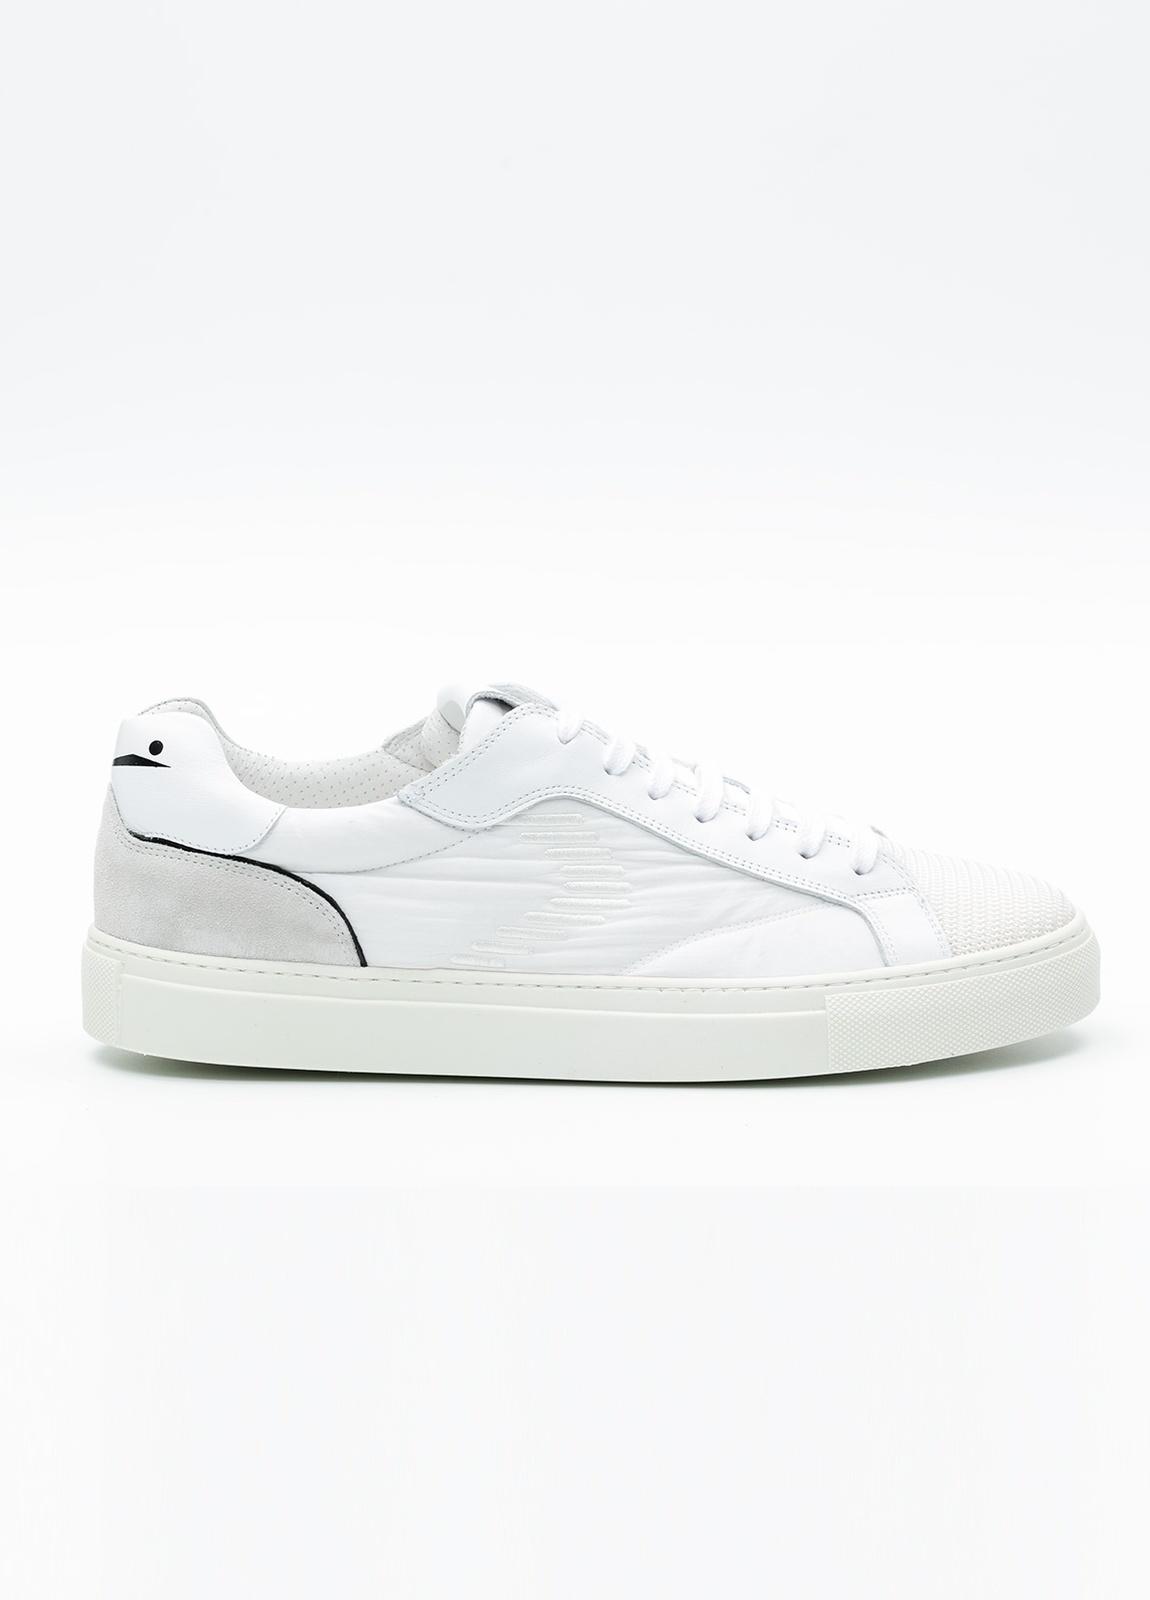 Bambas moda hombre modelo PORTOFINO color blanco, Serraje y tejido técnico.